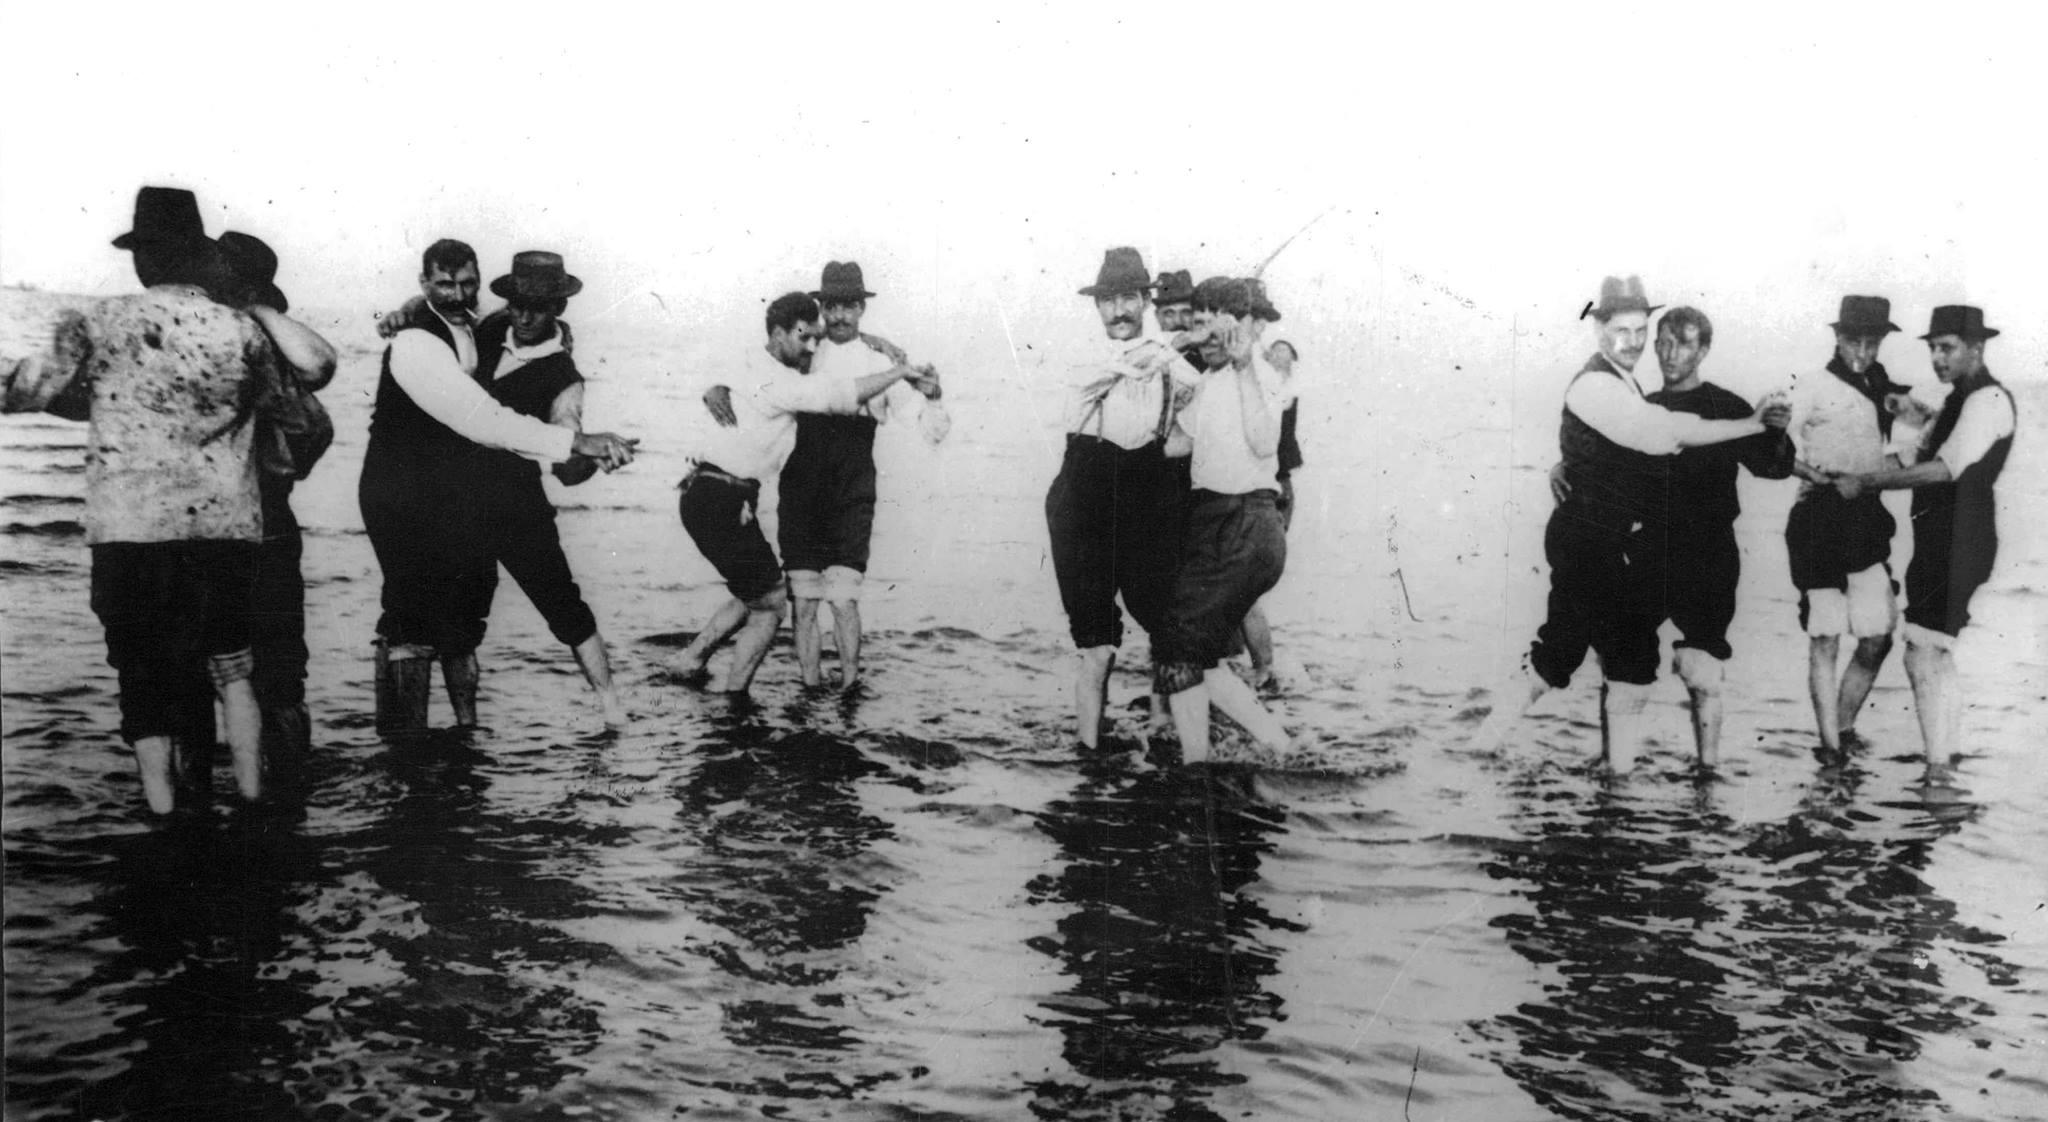 Buenos Aires: Striking Railway Workers in 1912